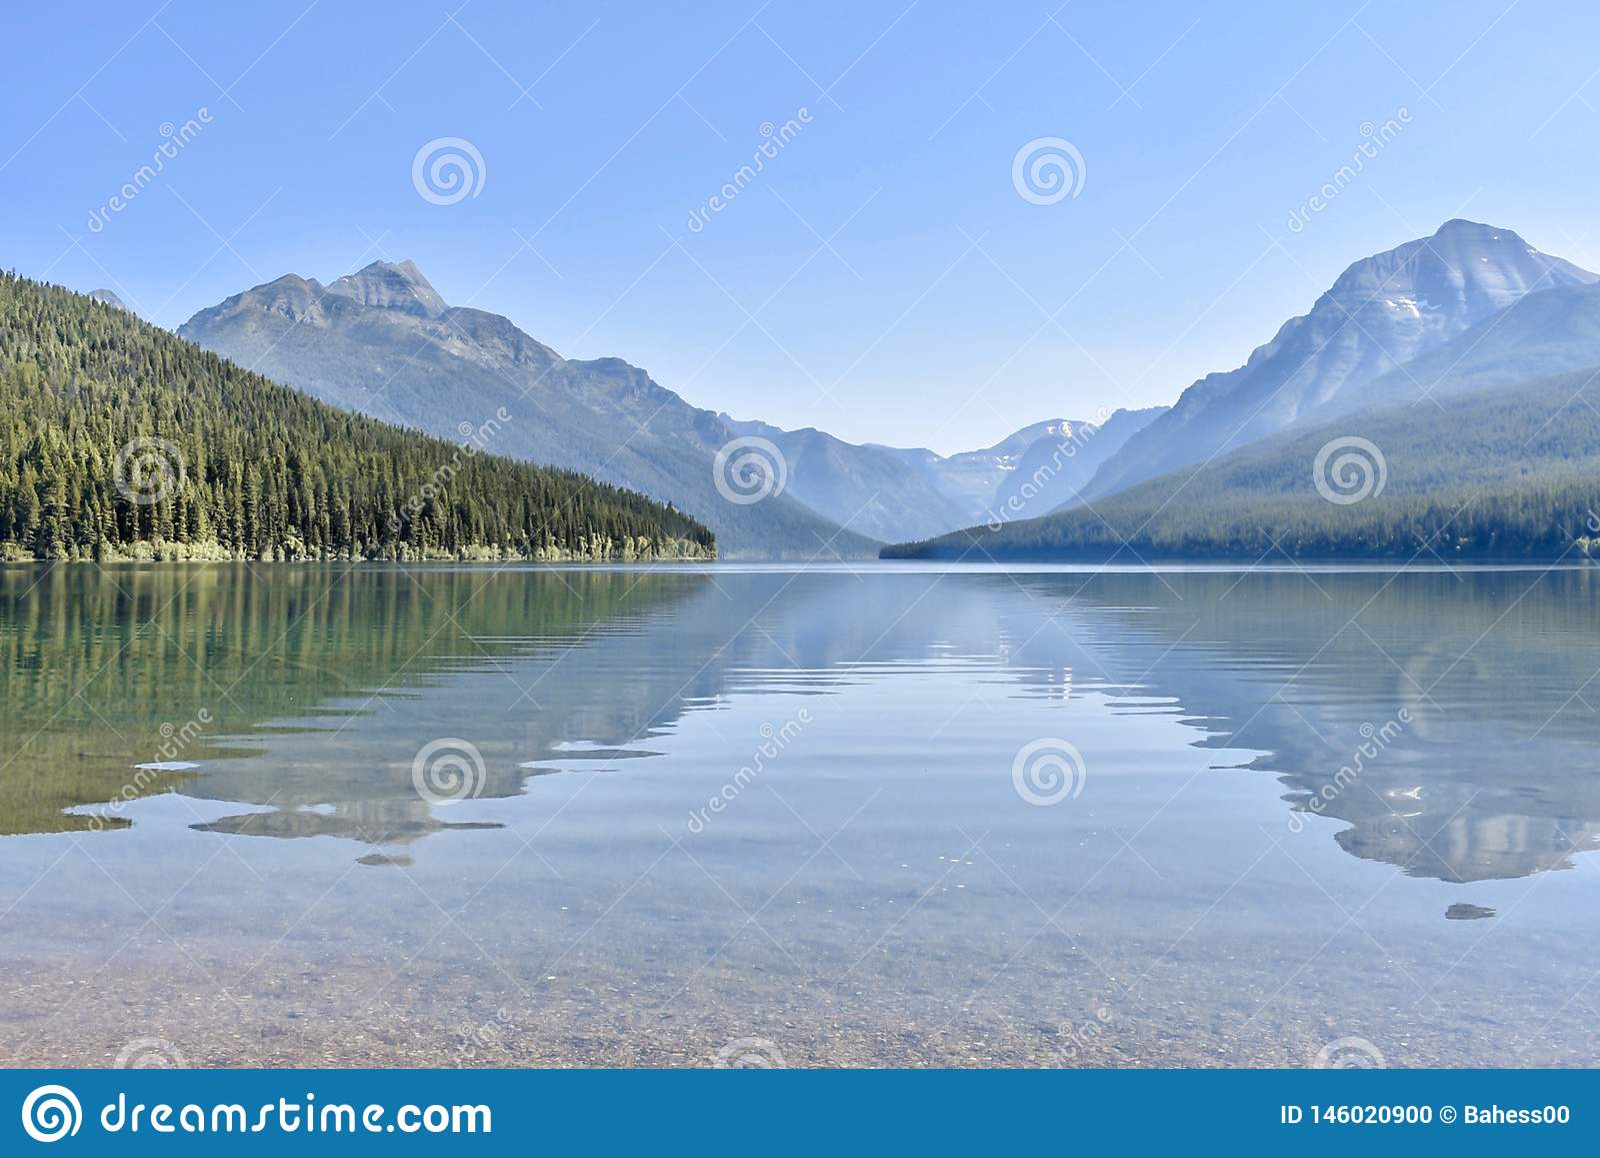 Glacier National Park del lago bowman, Montana